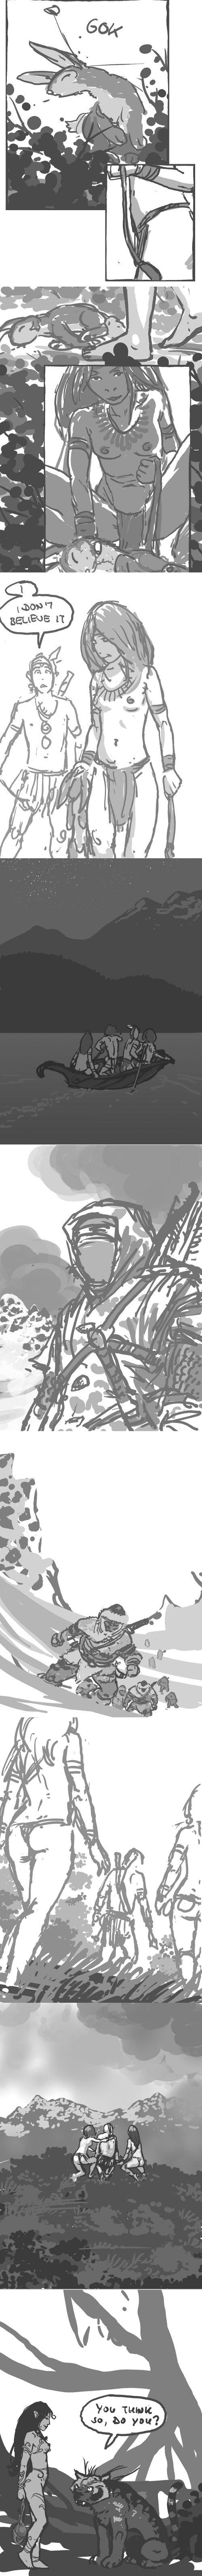 http://www.telayaunddiomancomic.de/images/sketchdump-14.03.14.jpg